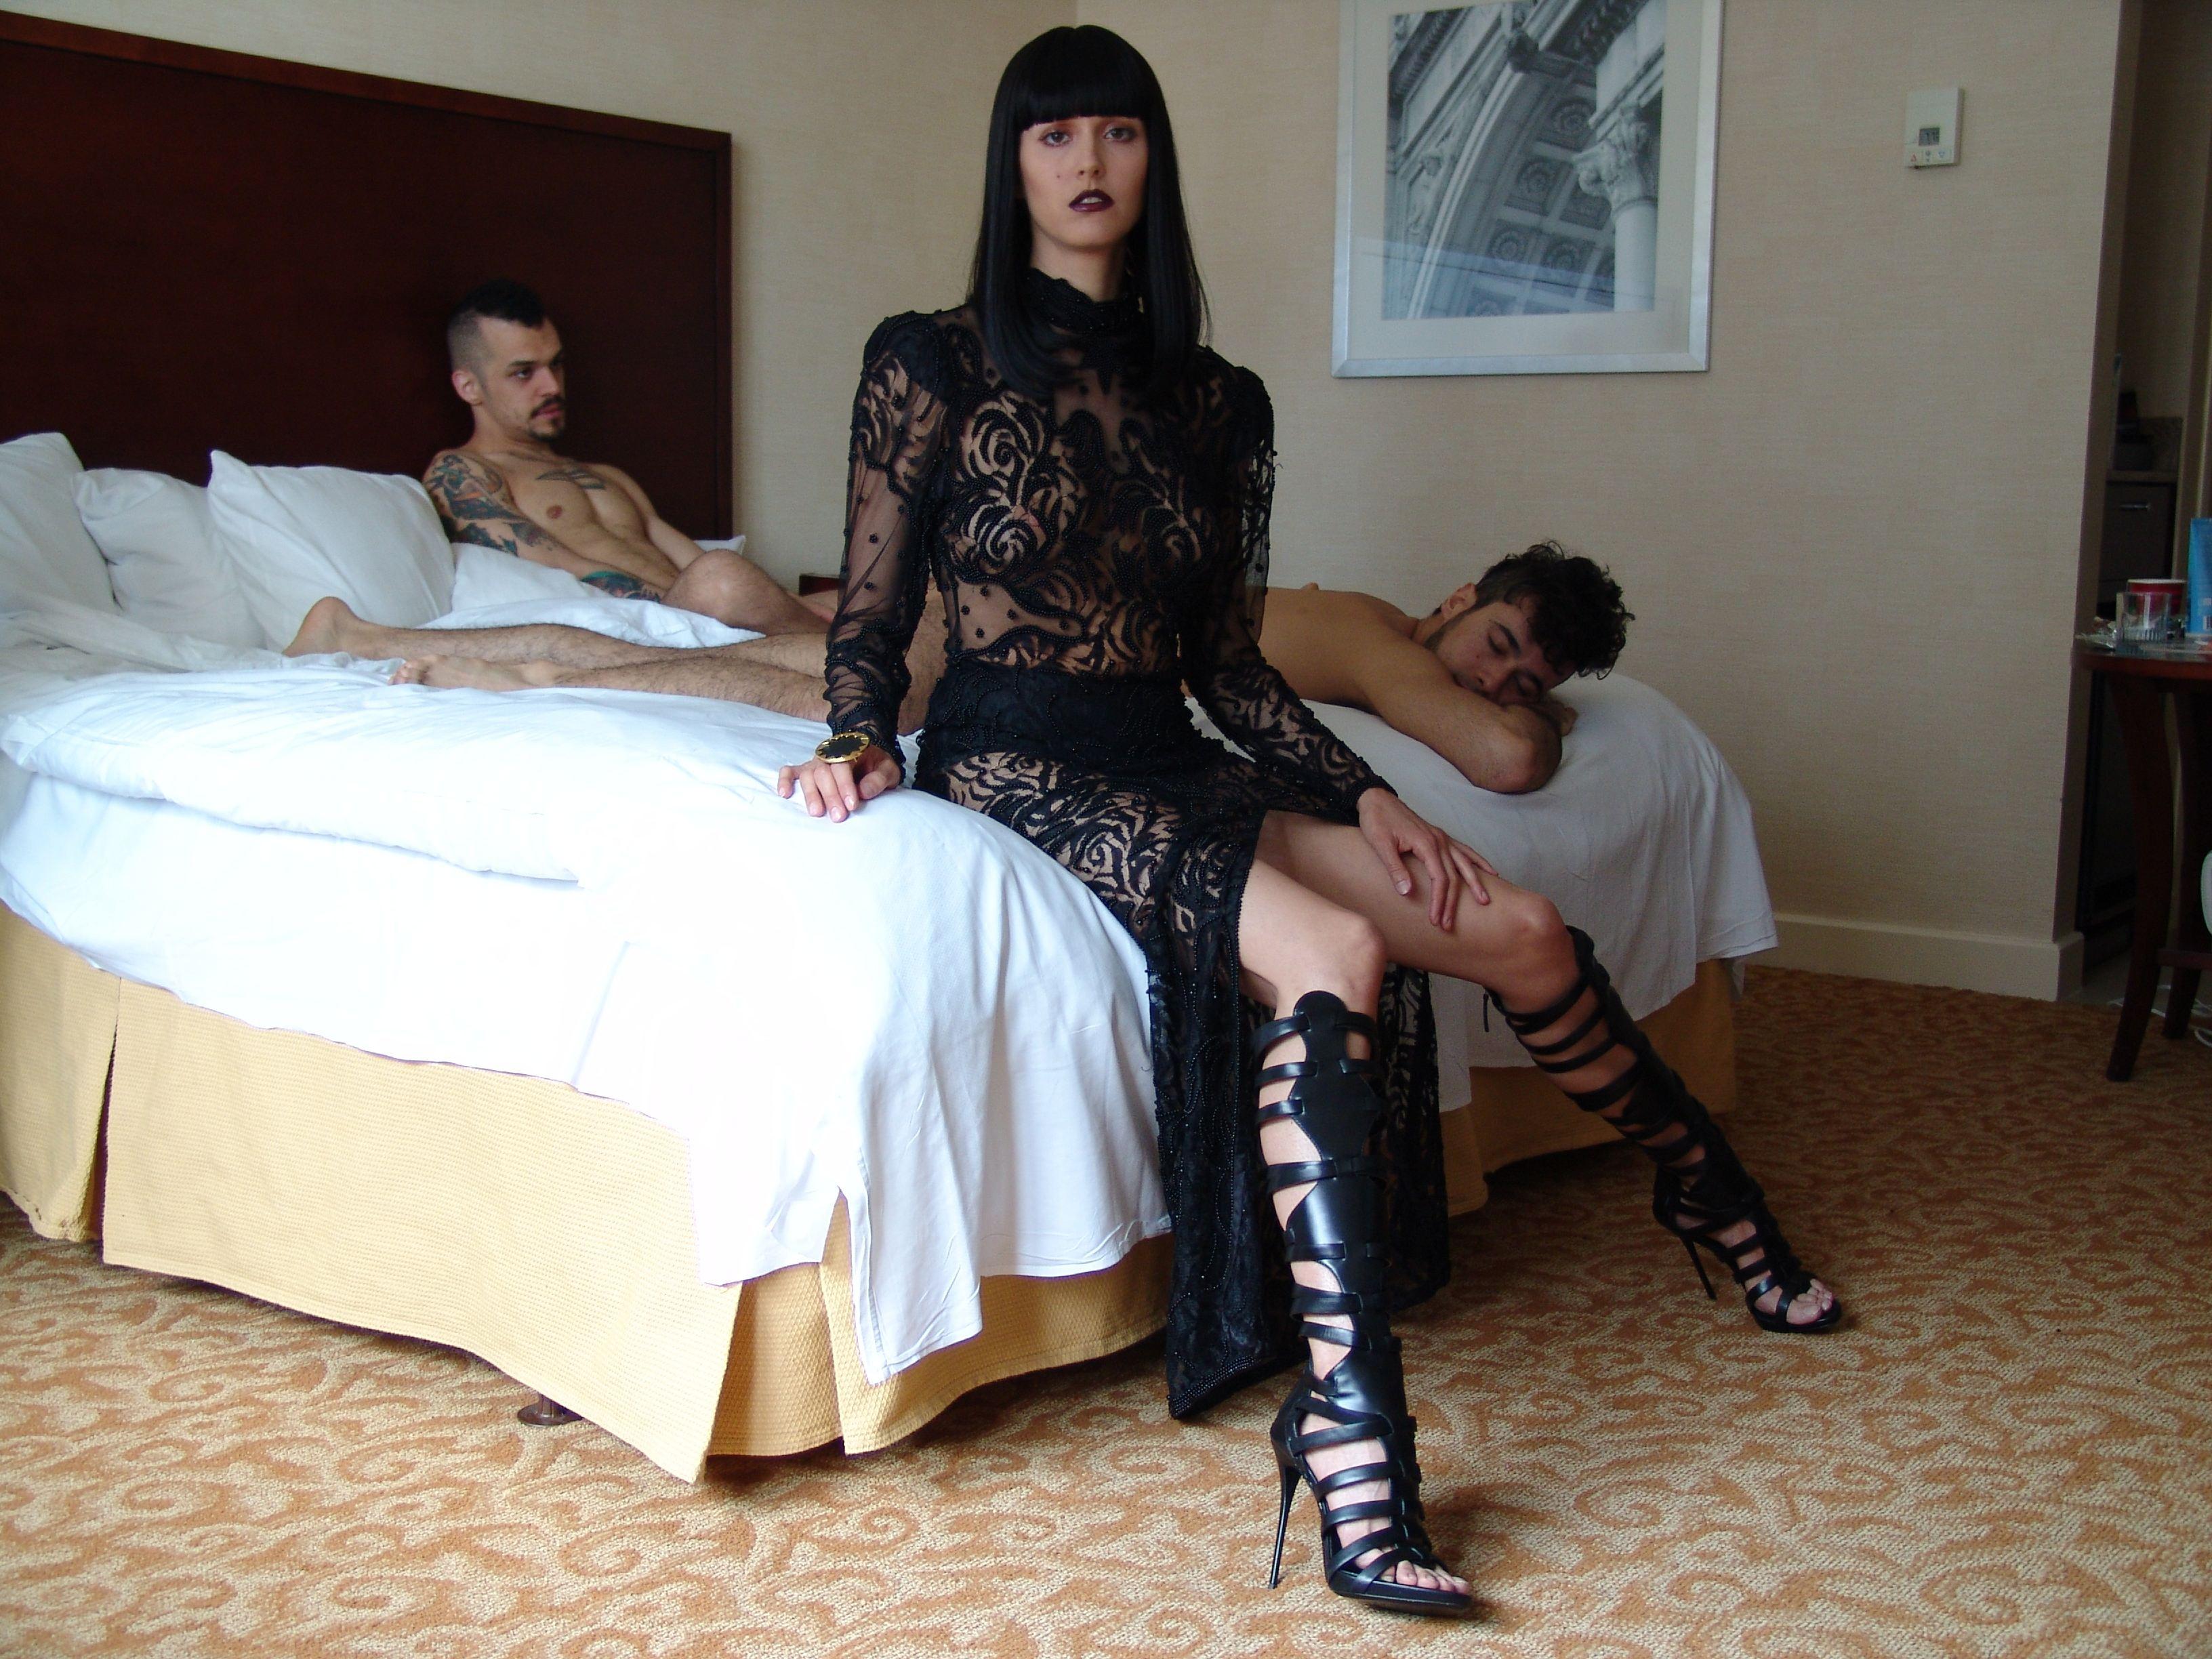 Cleo black lace dress option #1.jpg